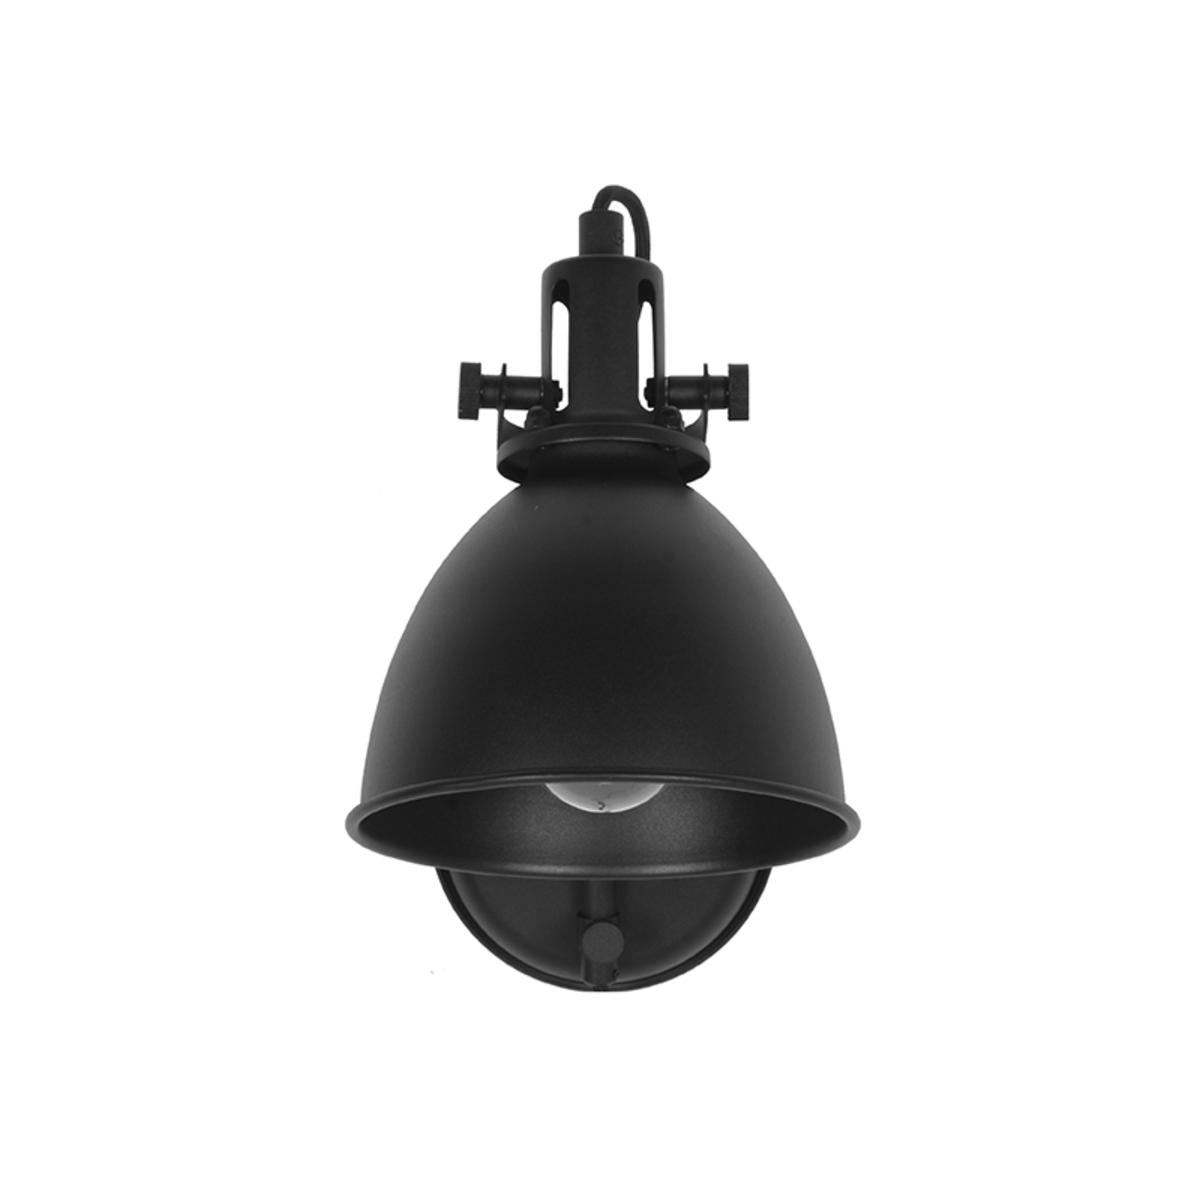 Wandlamp Spot - Zwart - Metaal